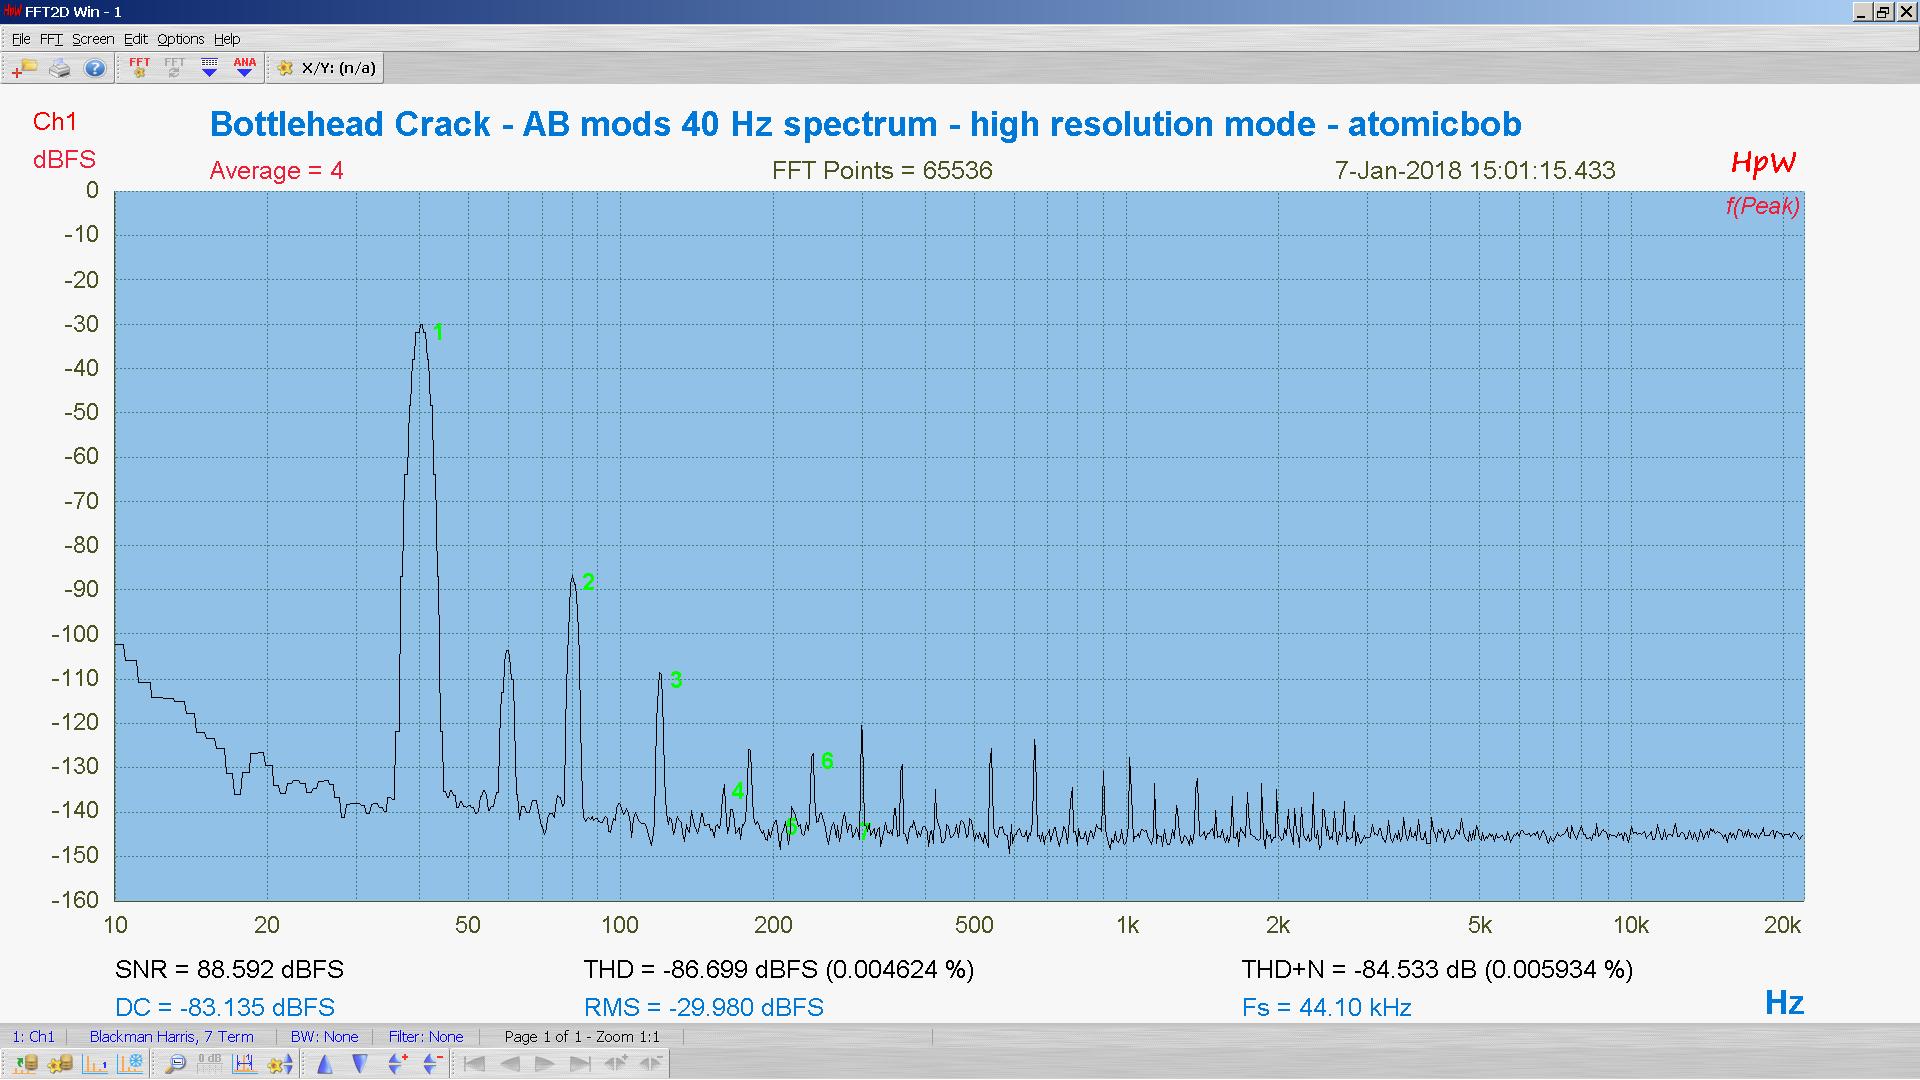 20180107-22 BH Crack e80cc 5998 40 Hz THD THD+N 65K FFT- ASIO -30 dBFS - HpW.PNG